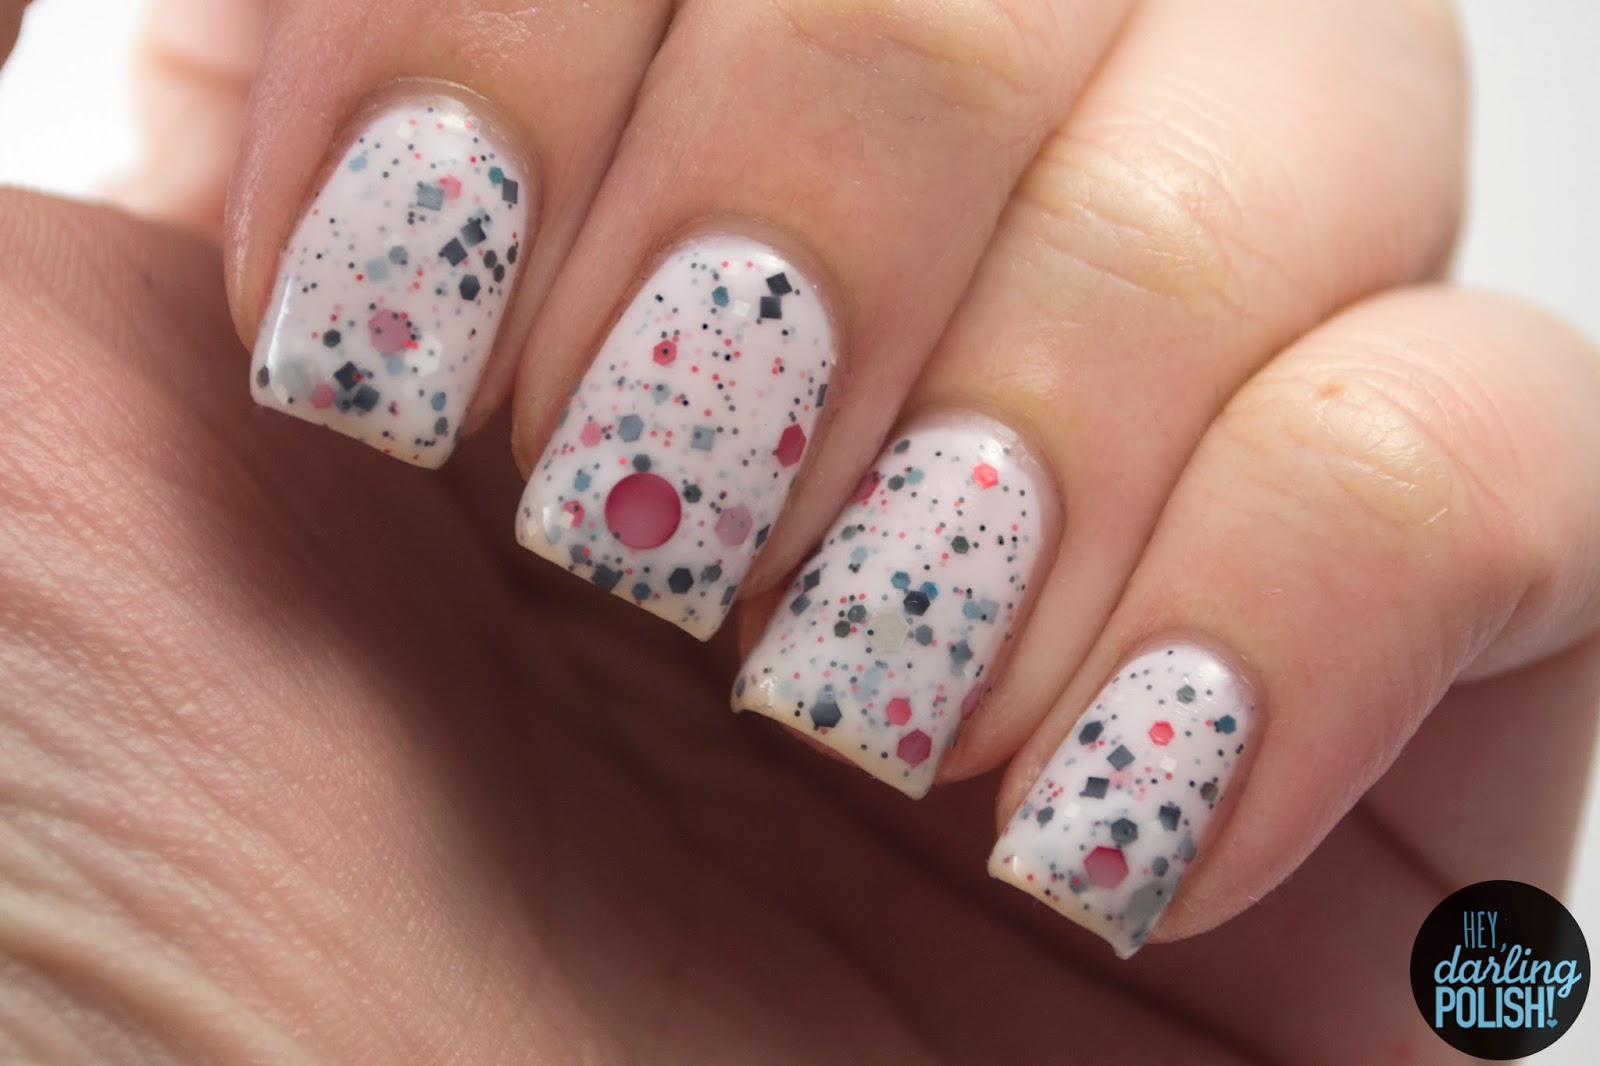 truly madly deeply, white, red, black, grey, glitter, nails, nail polish, polish, indie, indie nail polish, indie polish, hey darling polish, squishy face polish